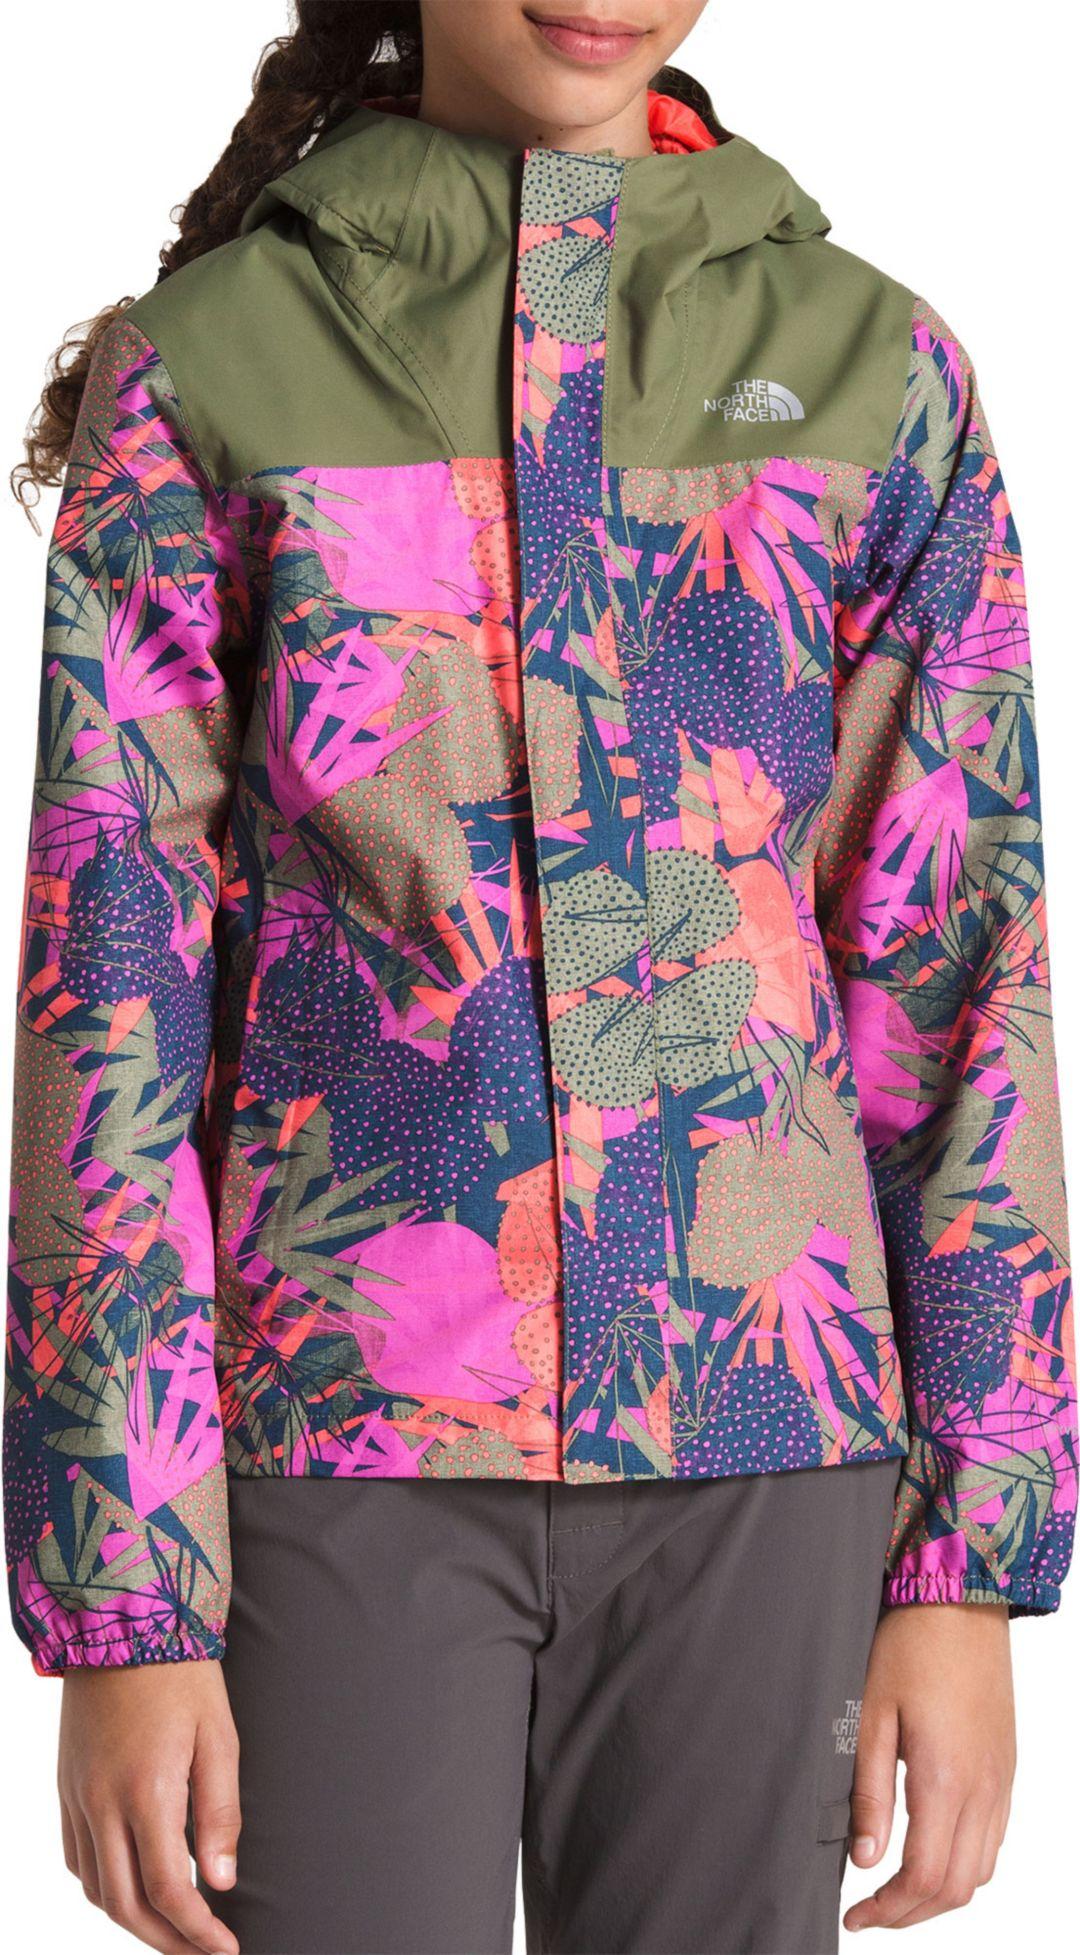 0335ef621 The North Face Girls' Resolve Reflective Jacket